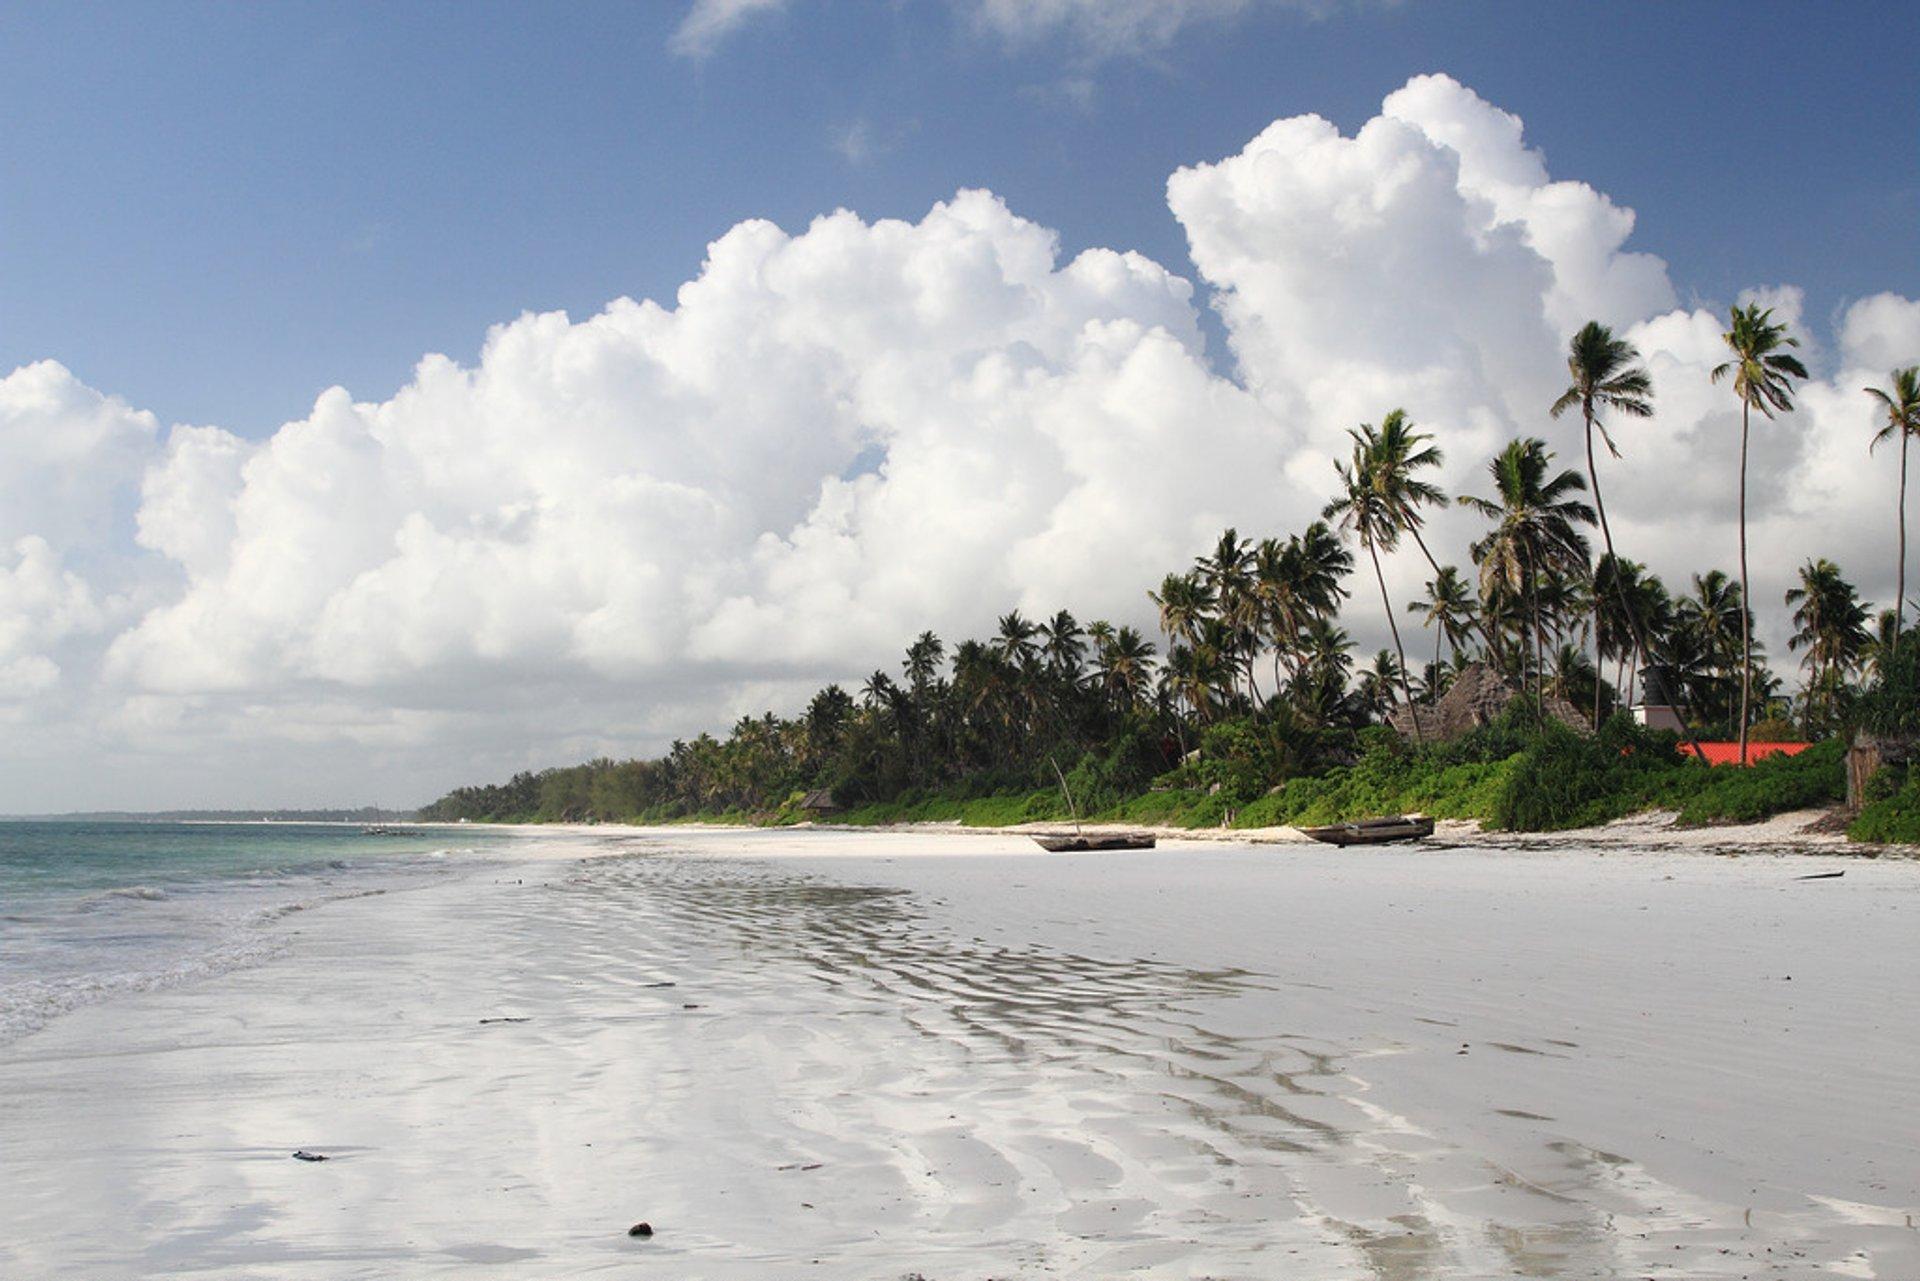 Beach Season in Tanzania - Best Season 2020